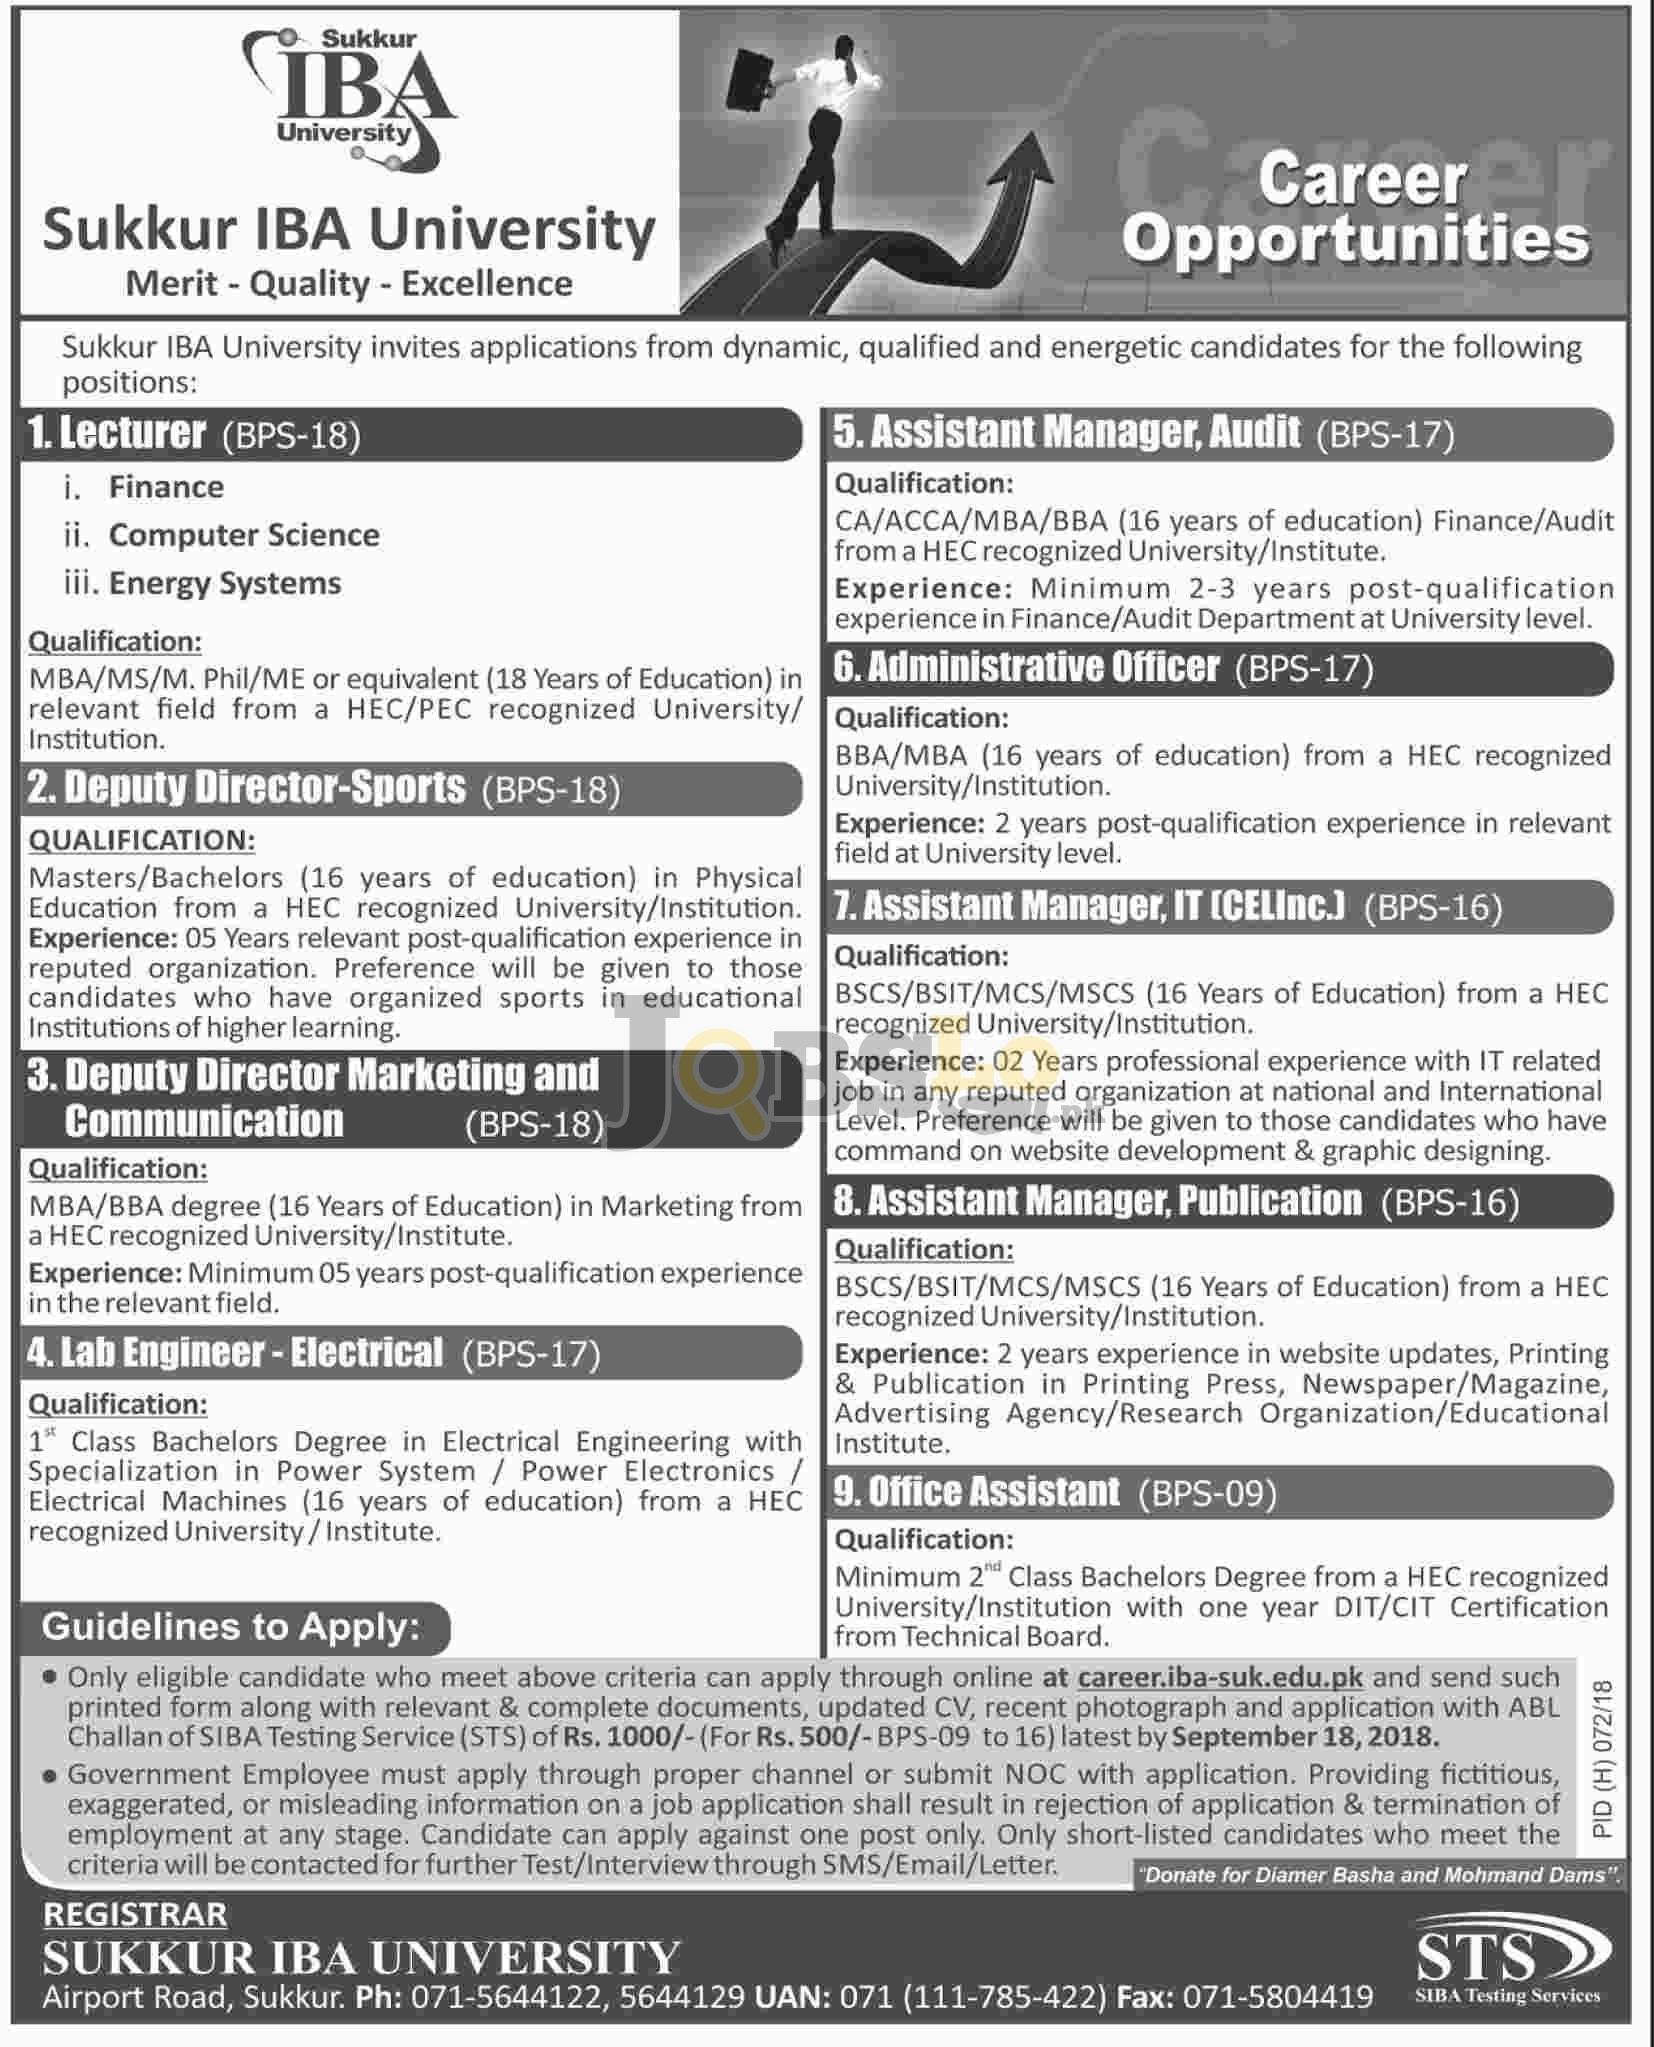 Sukkur IBA University Jobs Sep 2018 Apply Online | www.iba-suk.edu.pk